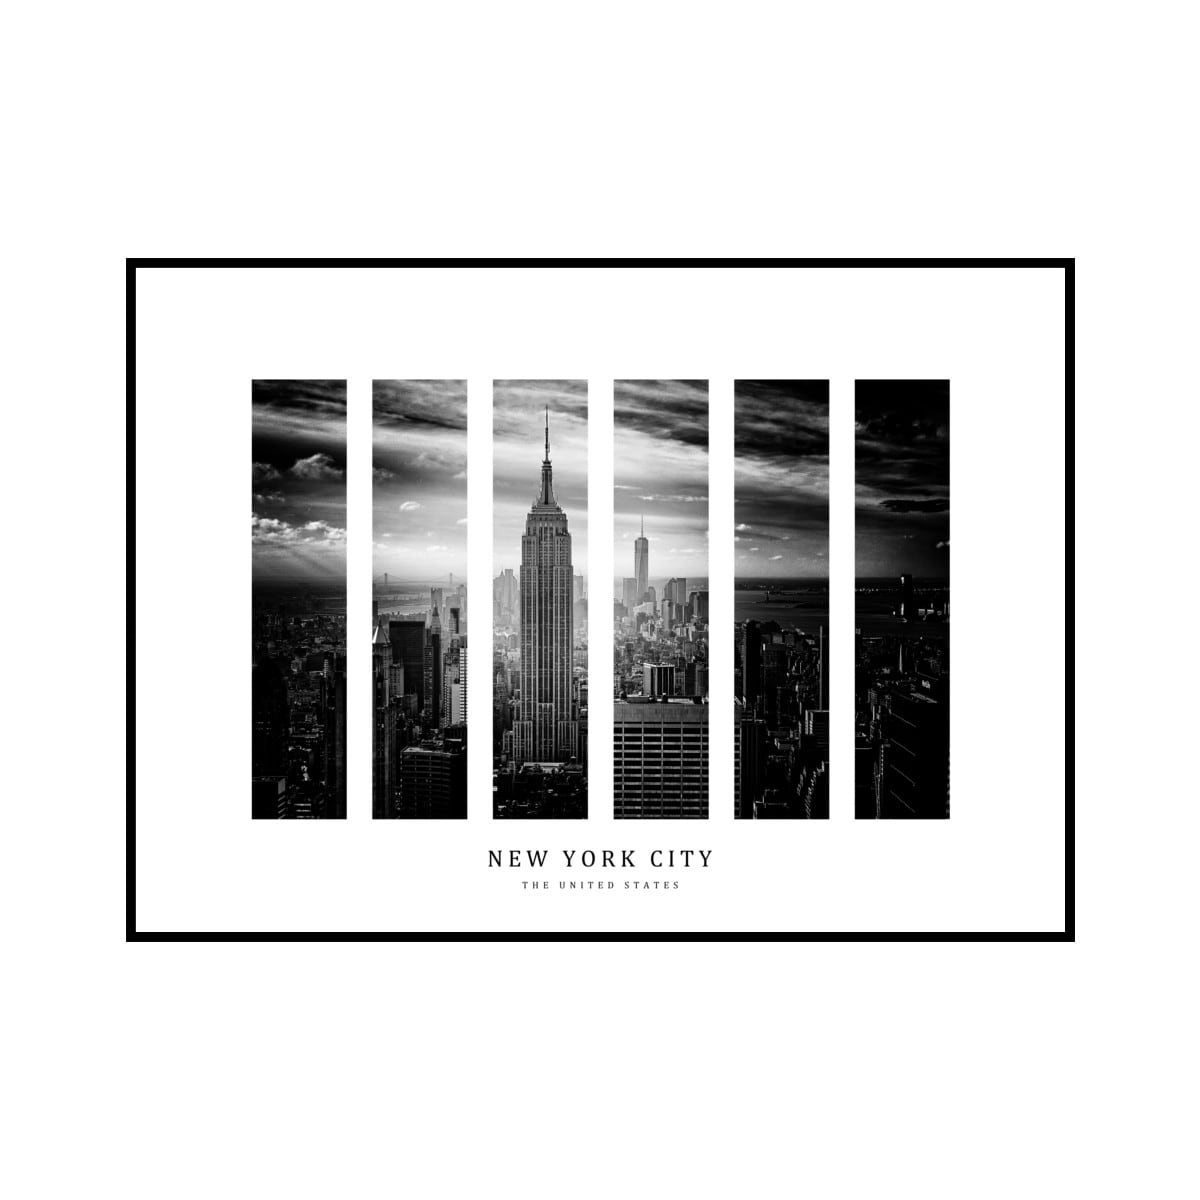 """NEW YORK CITY"" US - POSTER [SD-000595] A4サイズ ポスター単品"